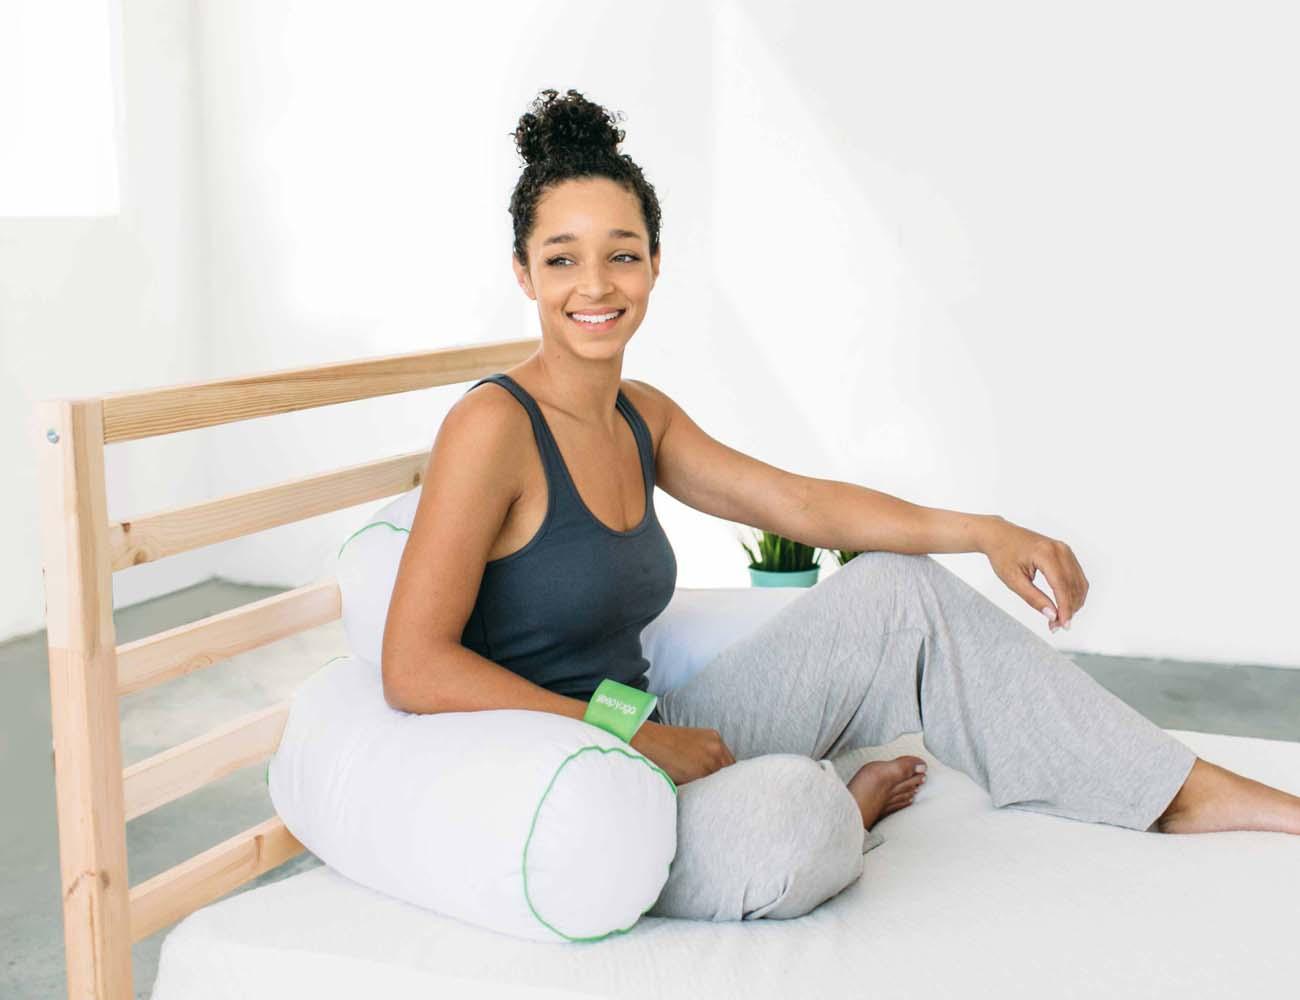 10 Sleep tech gadgets to help you get some shuteye - Sleep Yoga 0